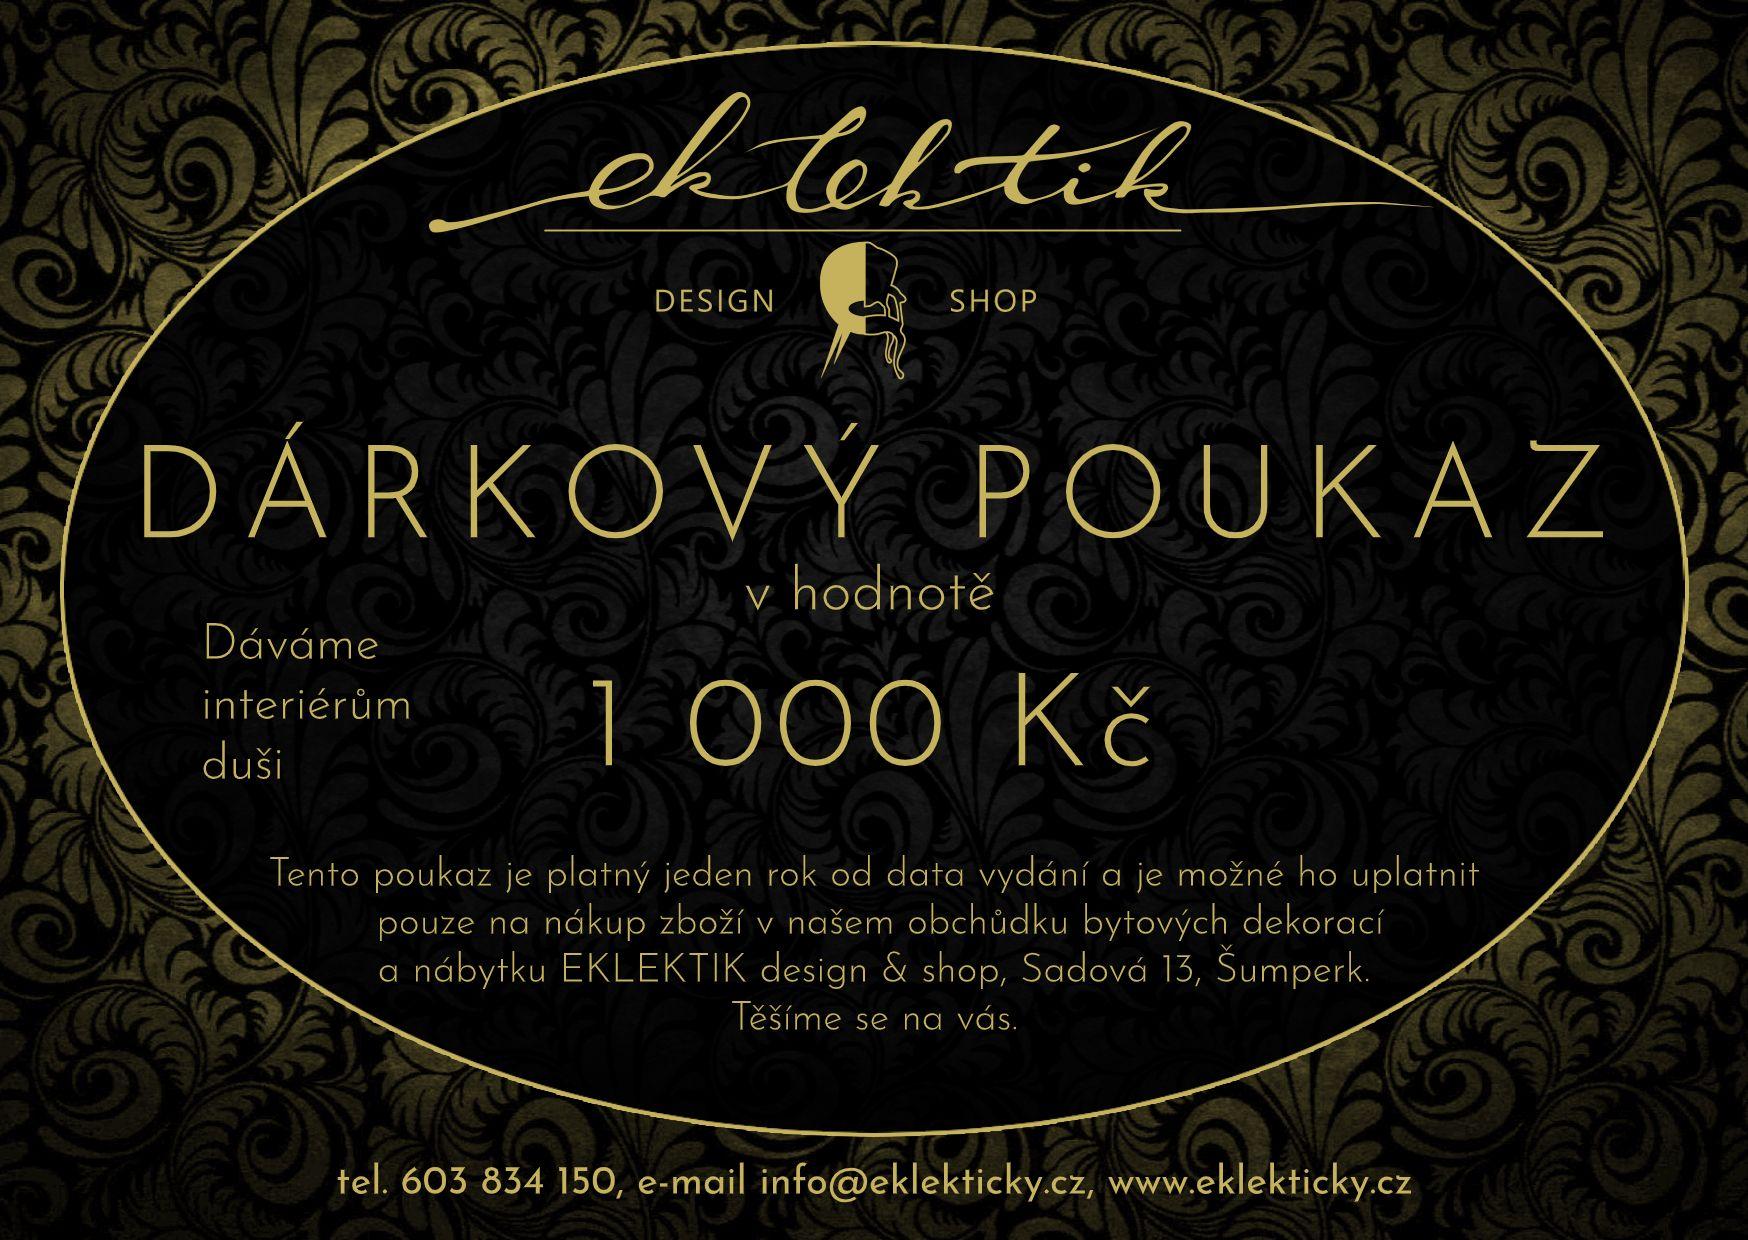 darkovy_poukaz_josefin1000